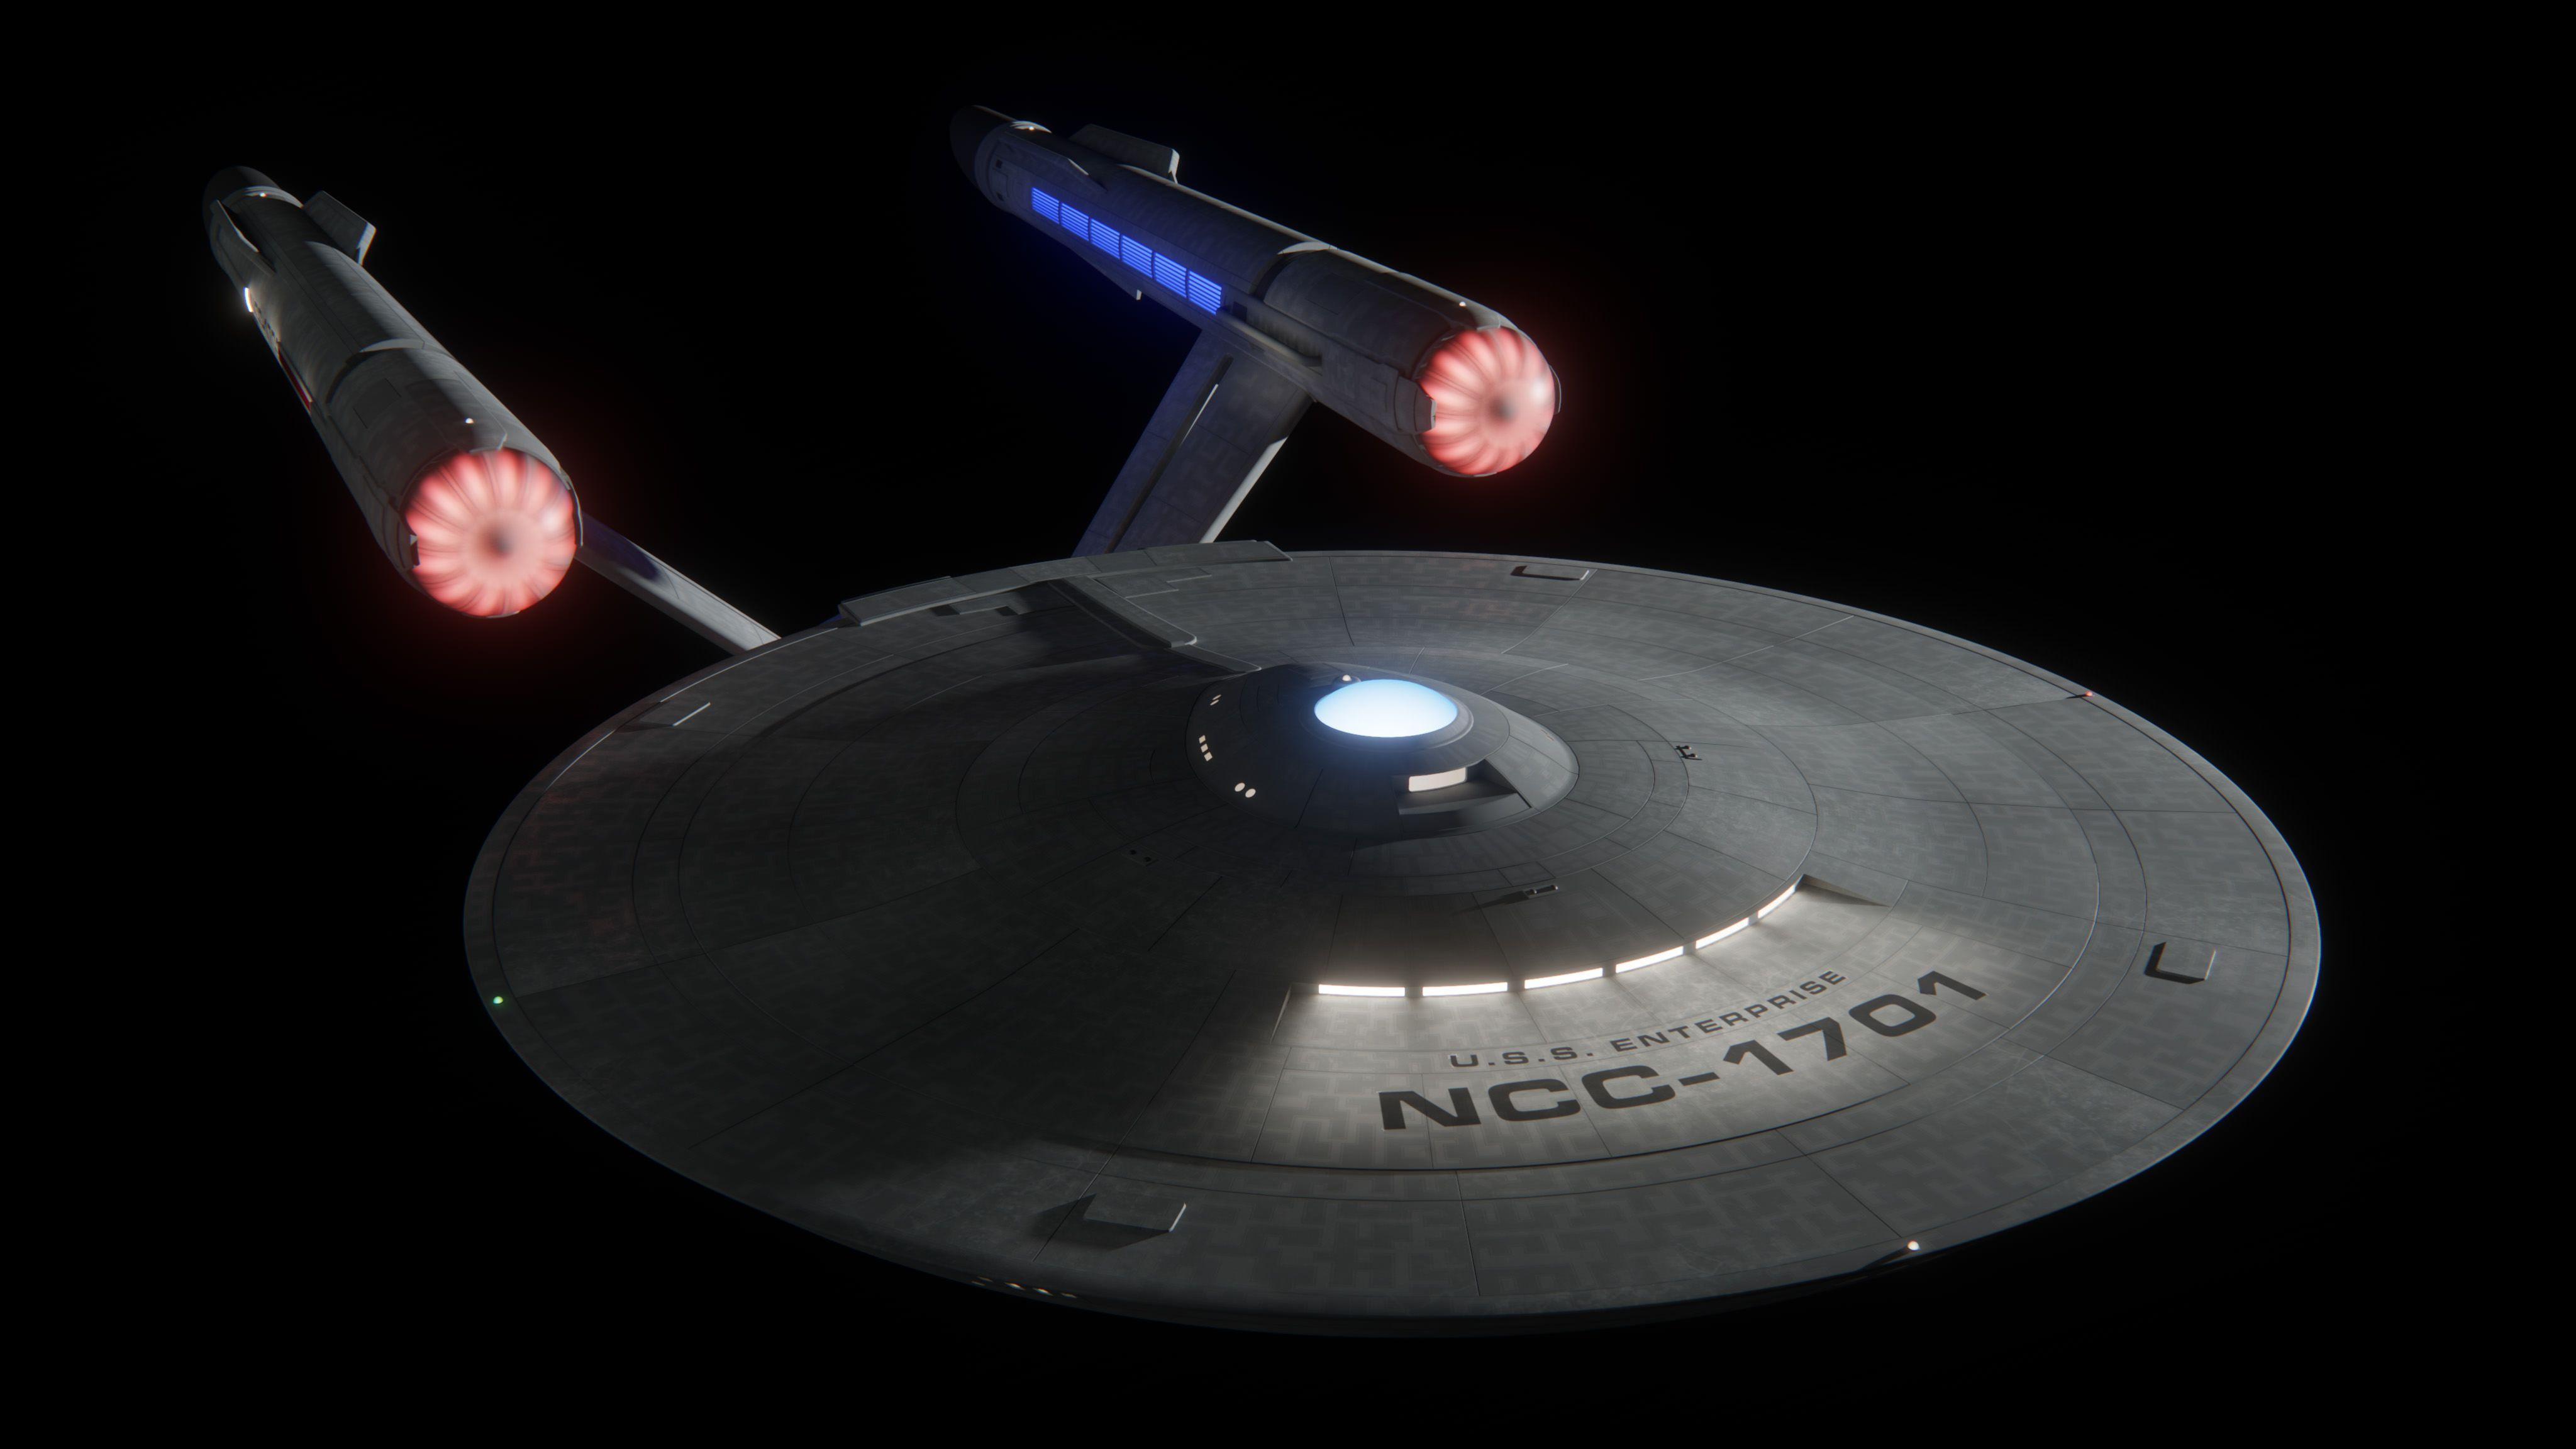 Bst enterprise sucks